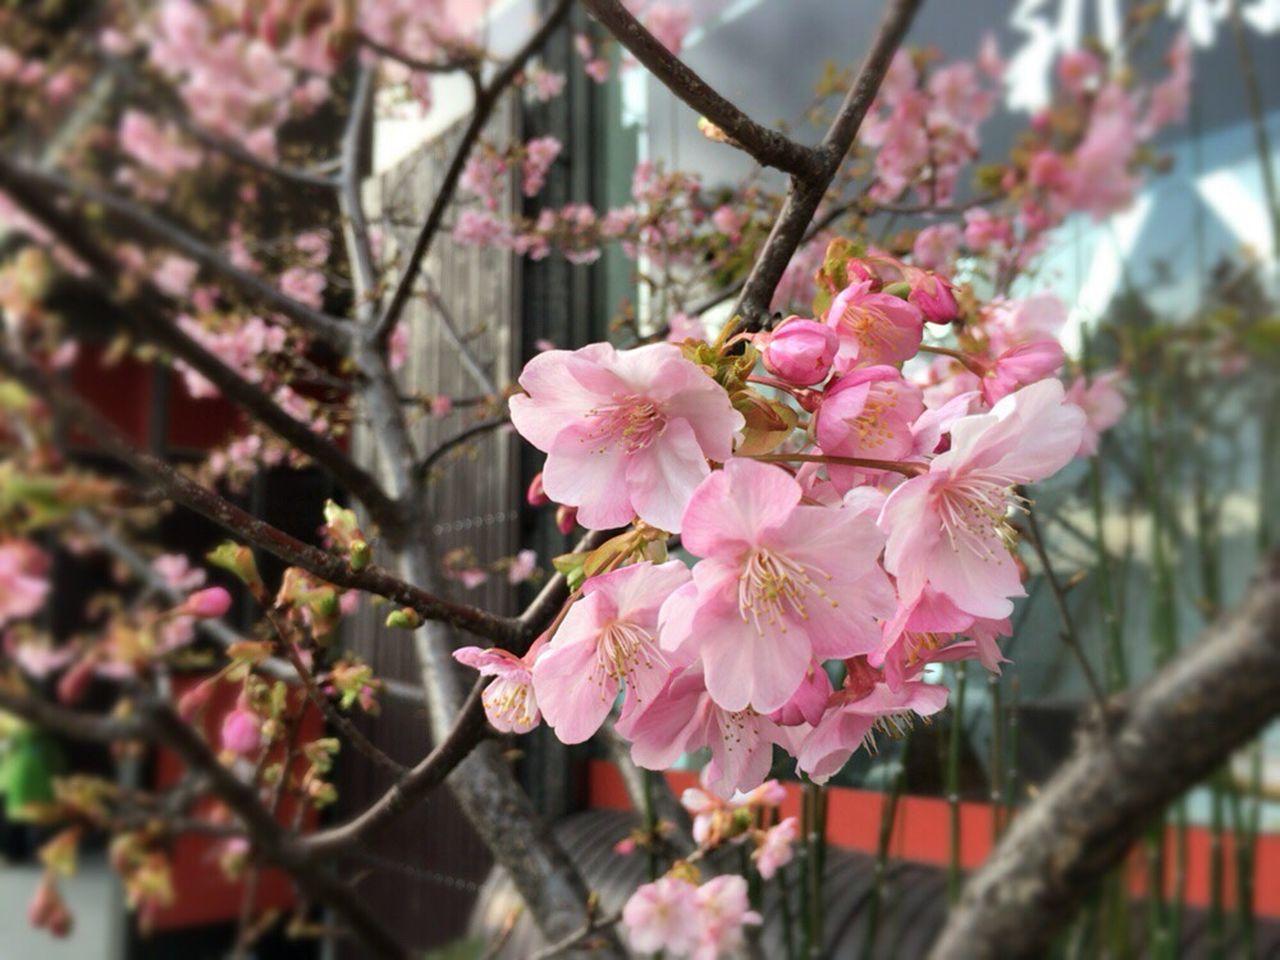 Kyoto City Cherry Blossom Sakura Kyoto,japan Cherry Blossoms Kyoto Cherry Blossom Sakura 2017 Kyoto Spling Flower Kyoto Spling Kyoto Sakura Kyoto Sakura 2017